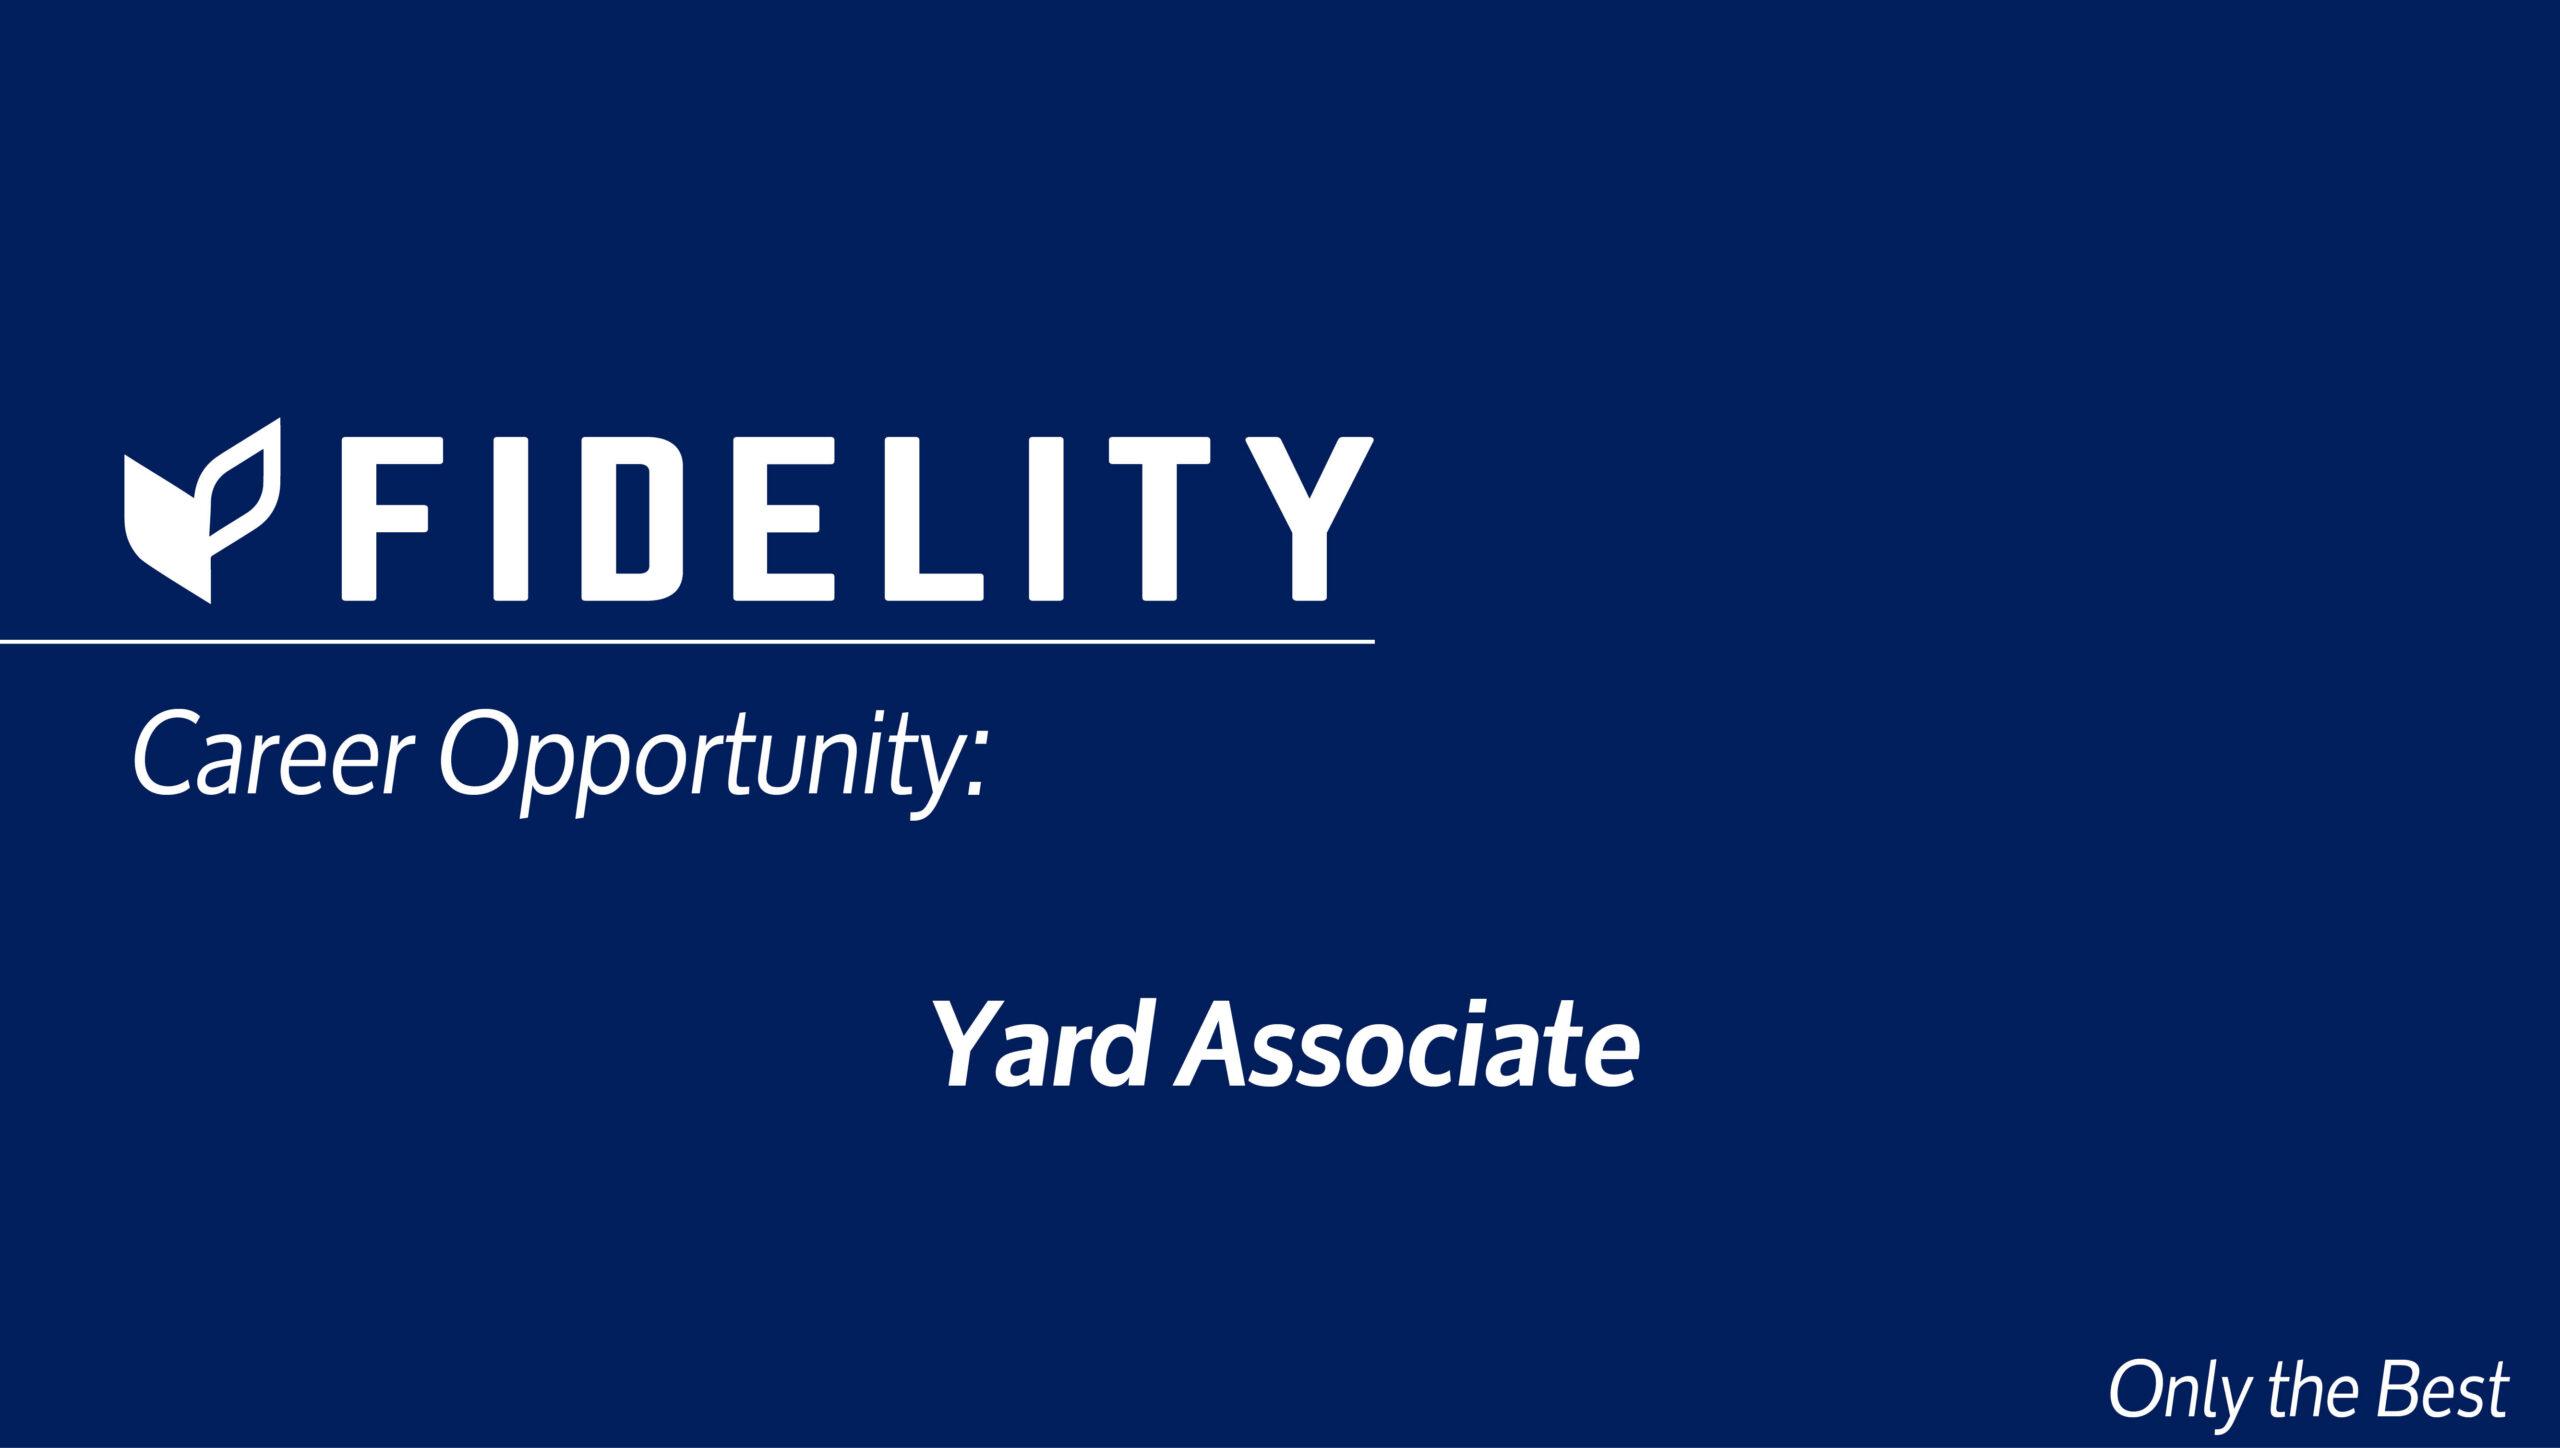 Career Opportunity: Yard Associate